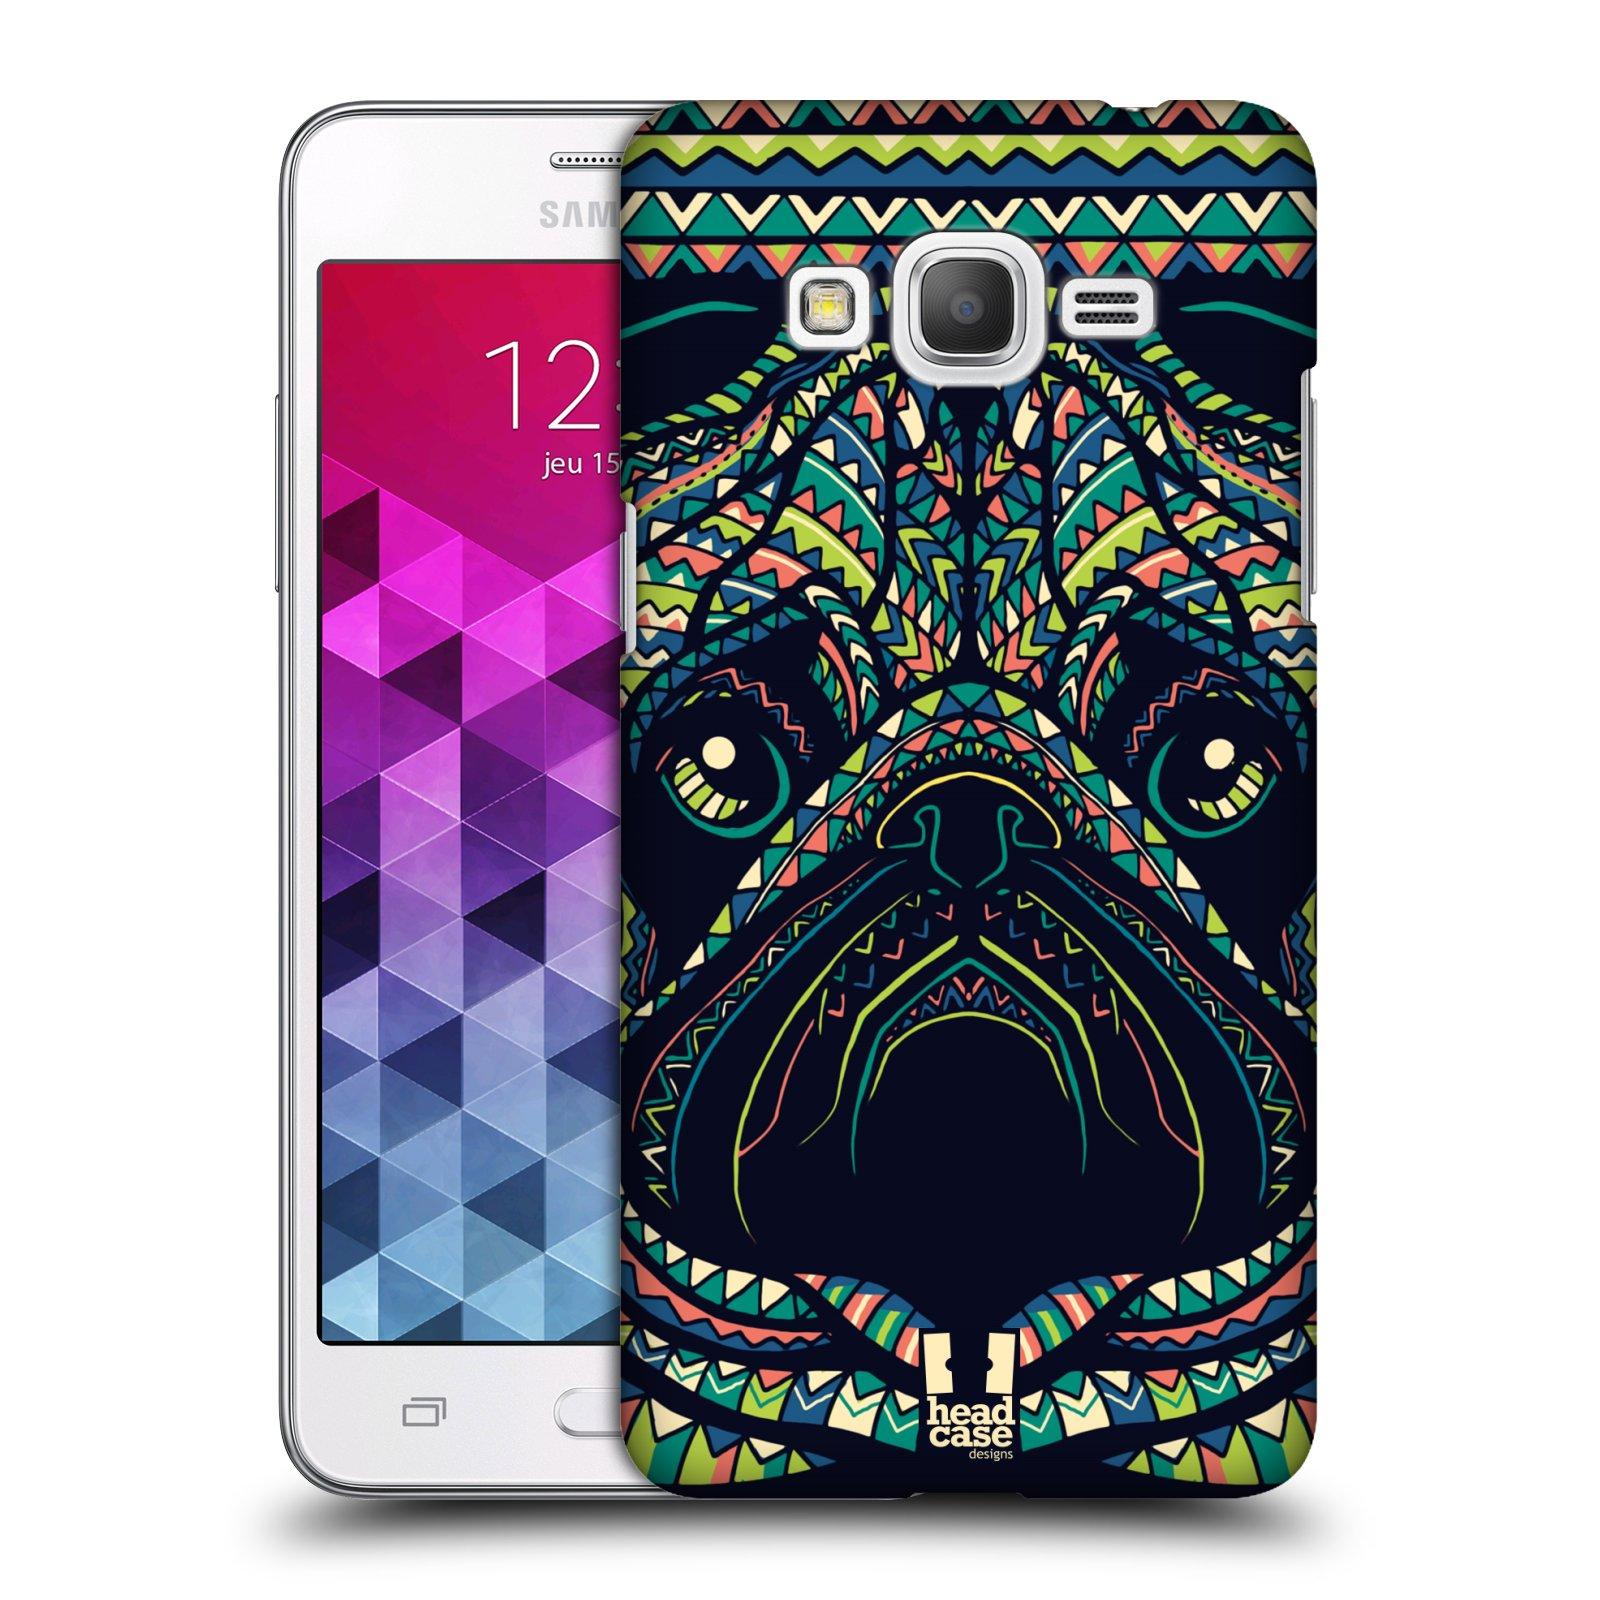 Plastové pouzdro na mobil Samsung Galaxy Grand Prime VE HEAD CASE AZTEC MOPS